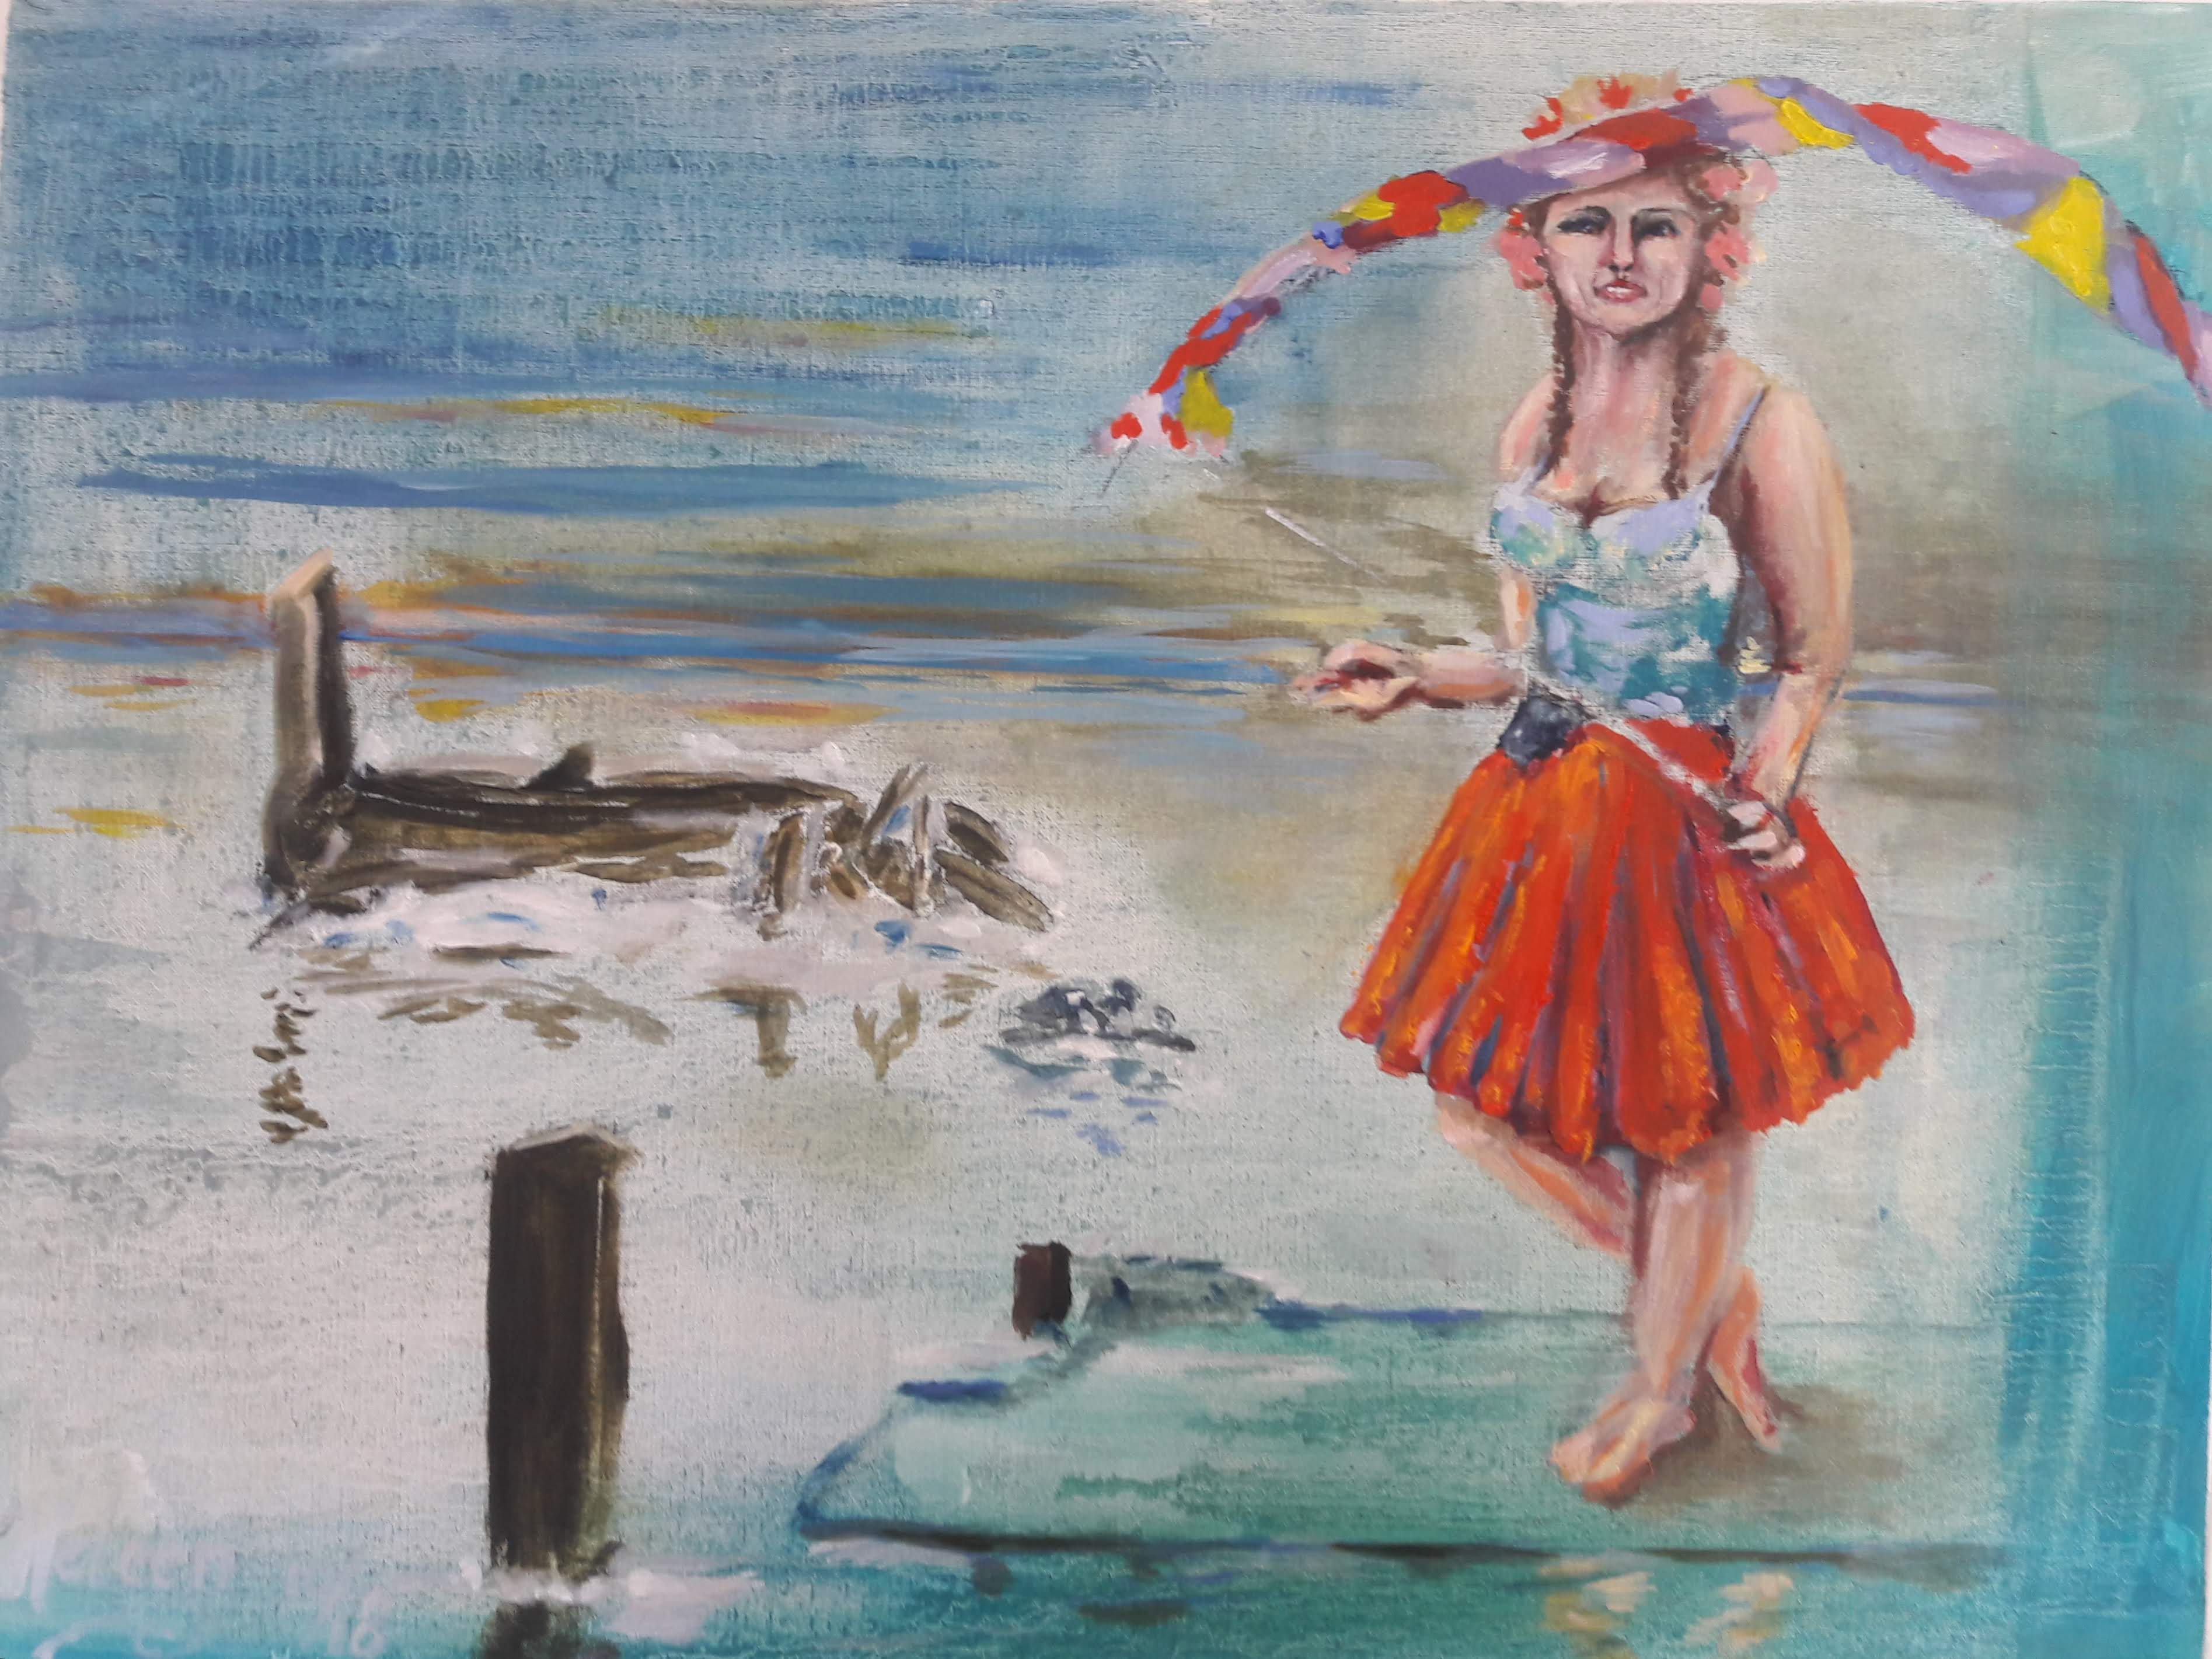 """Lorelei"" Olieverf op papier; 50cm x 65cm  10/18 € 200,- excl lijst"